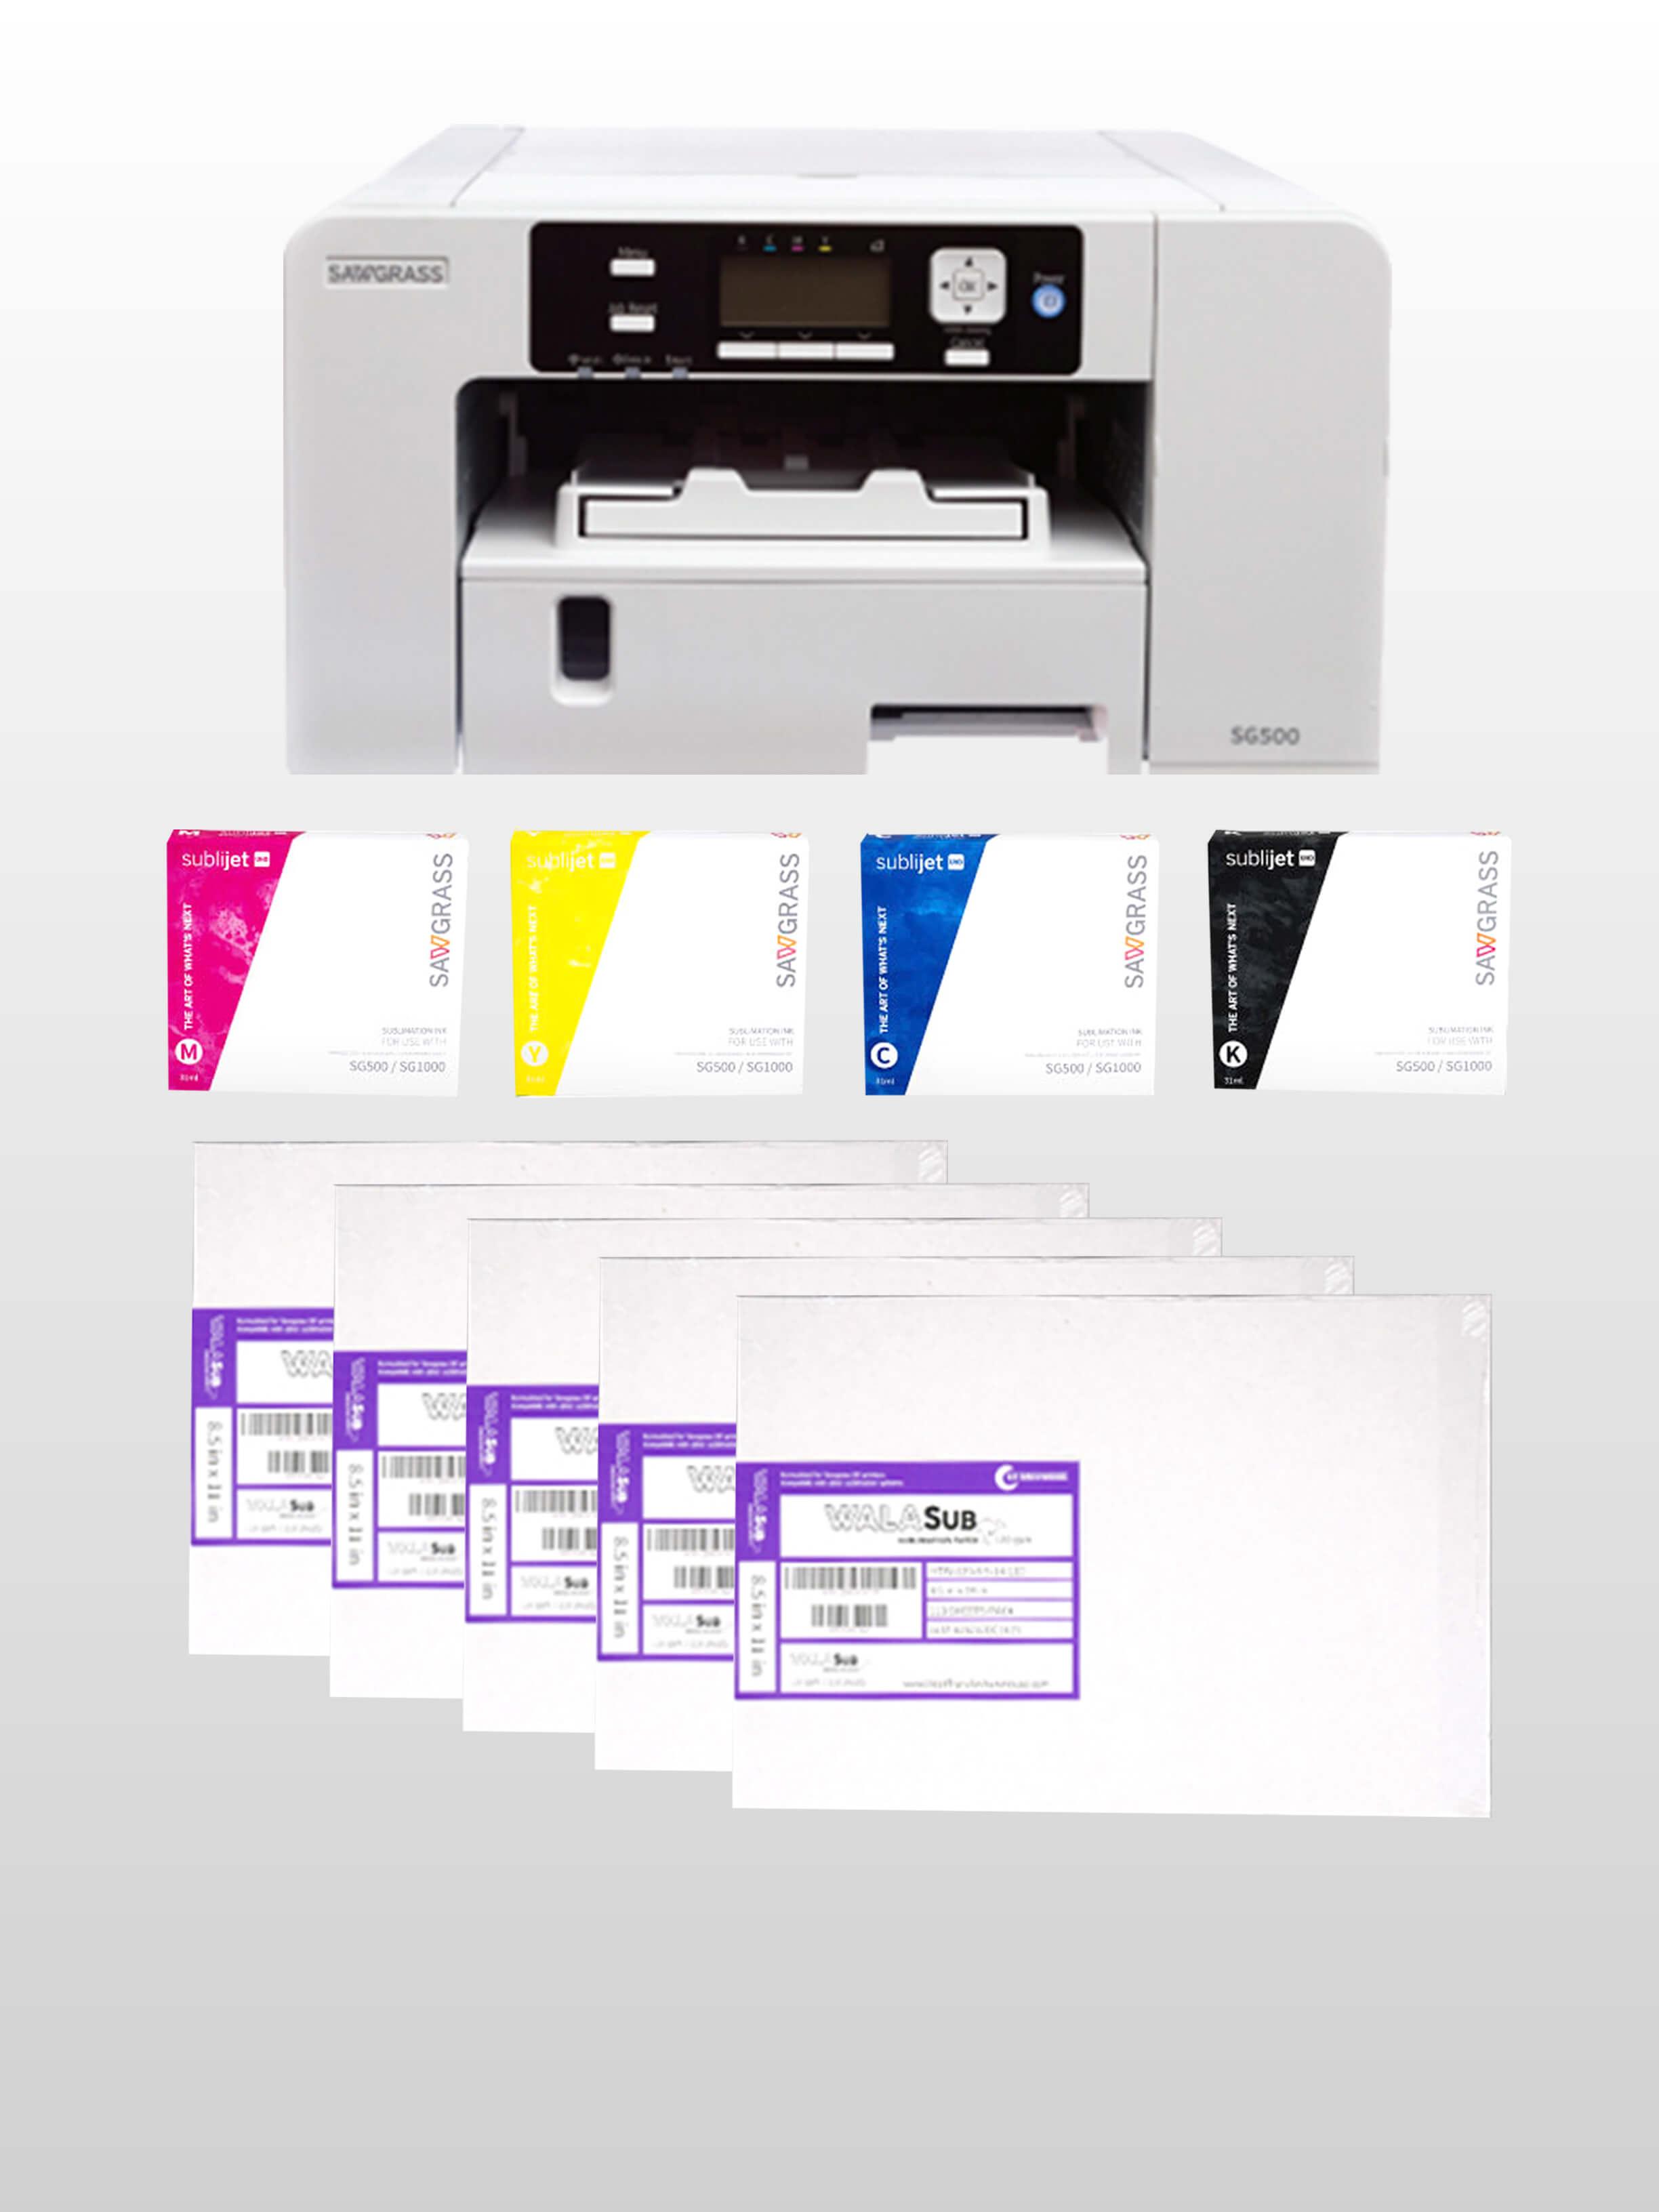 Sawgrass Dye Sublimation Printers